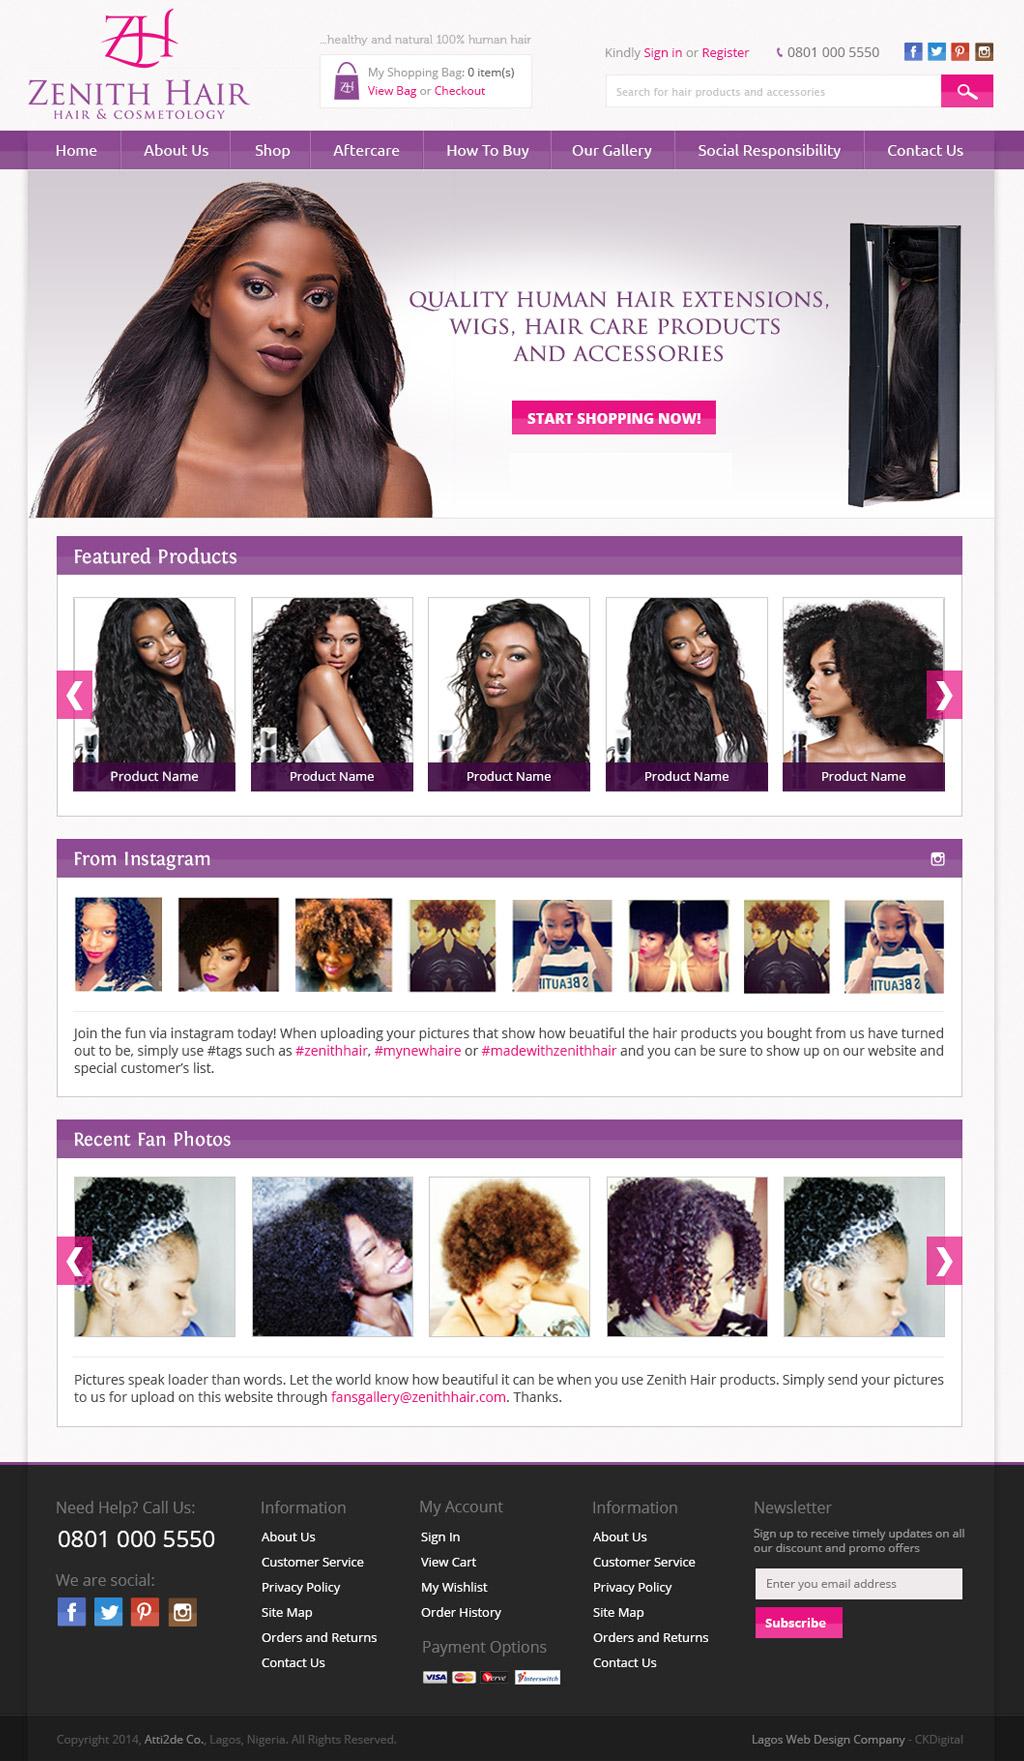 zenith-hair-website-homepage-development